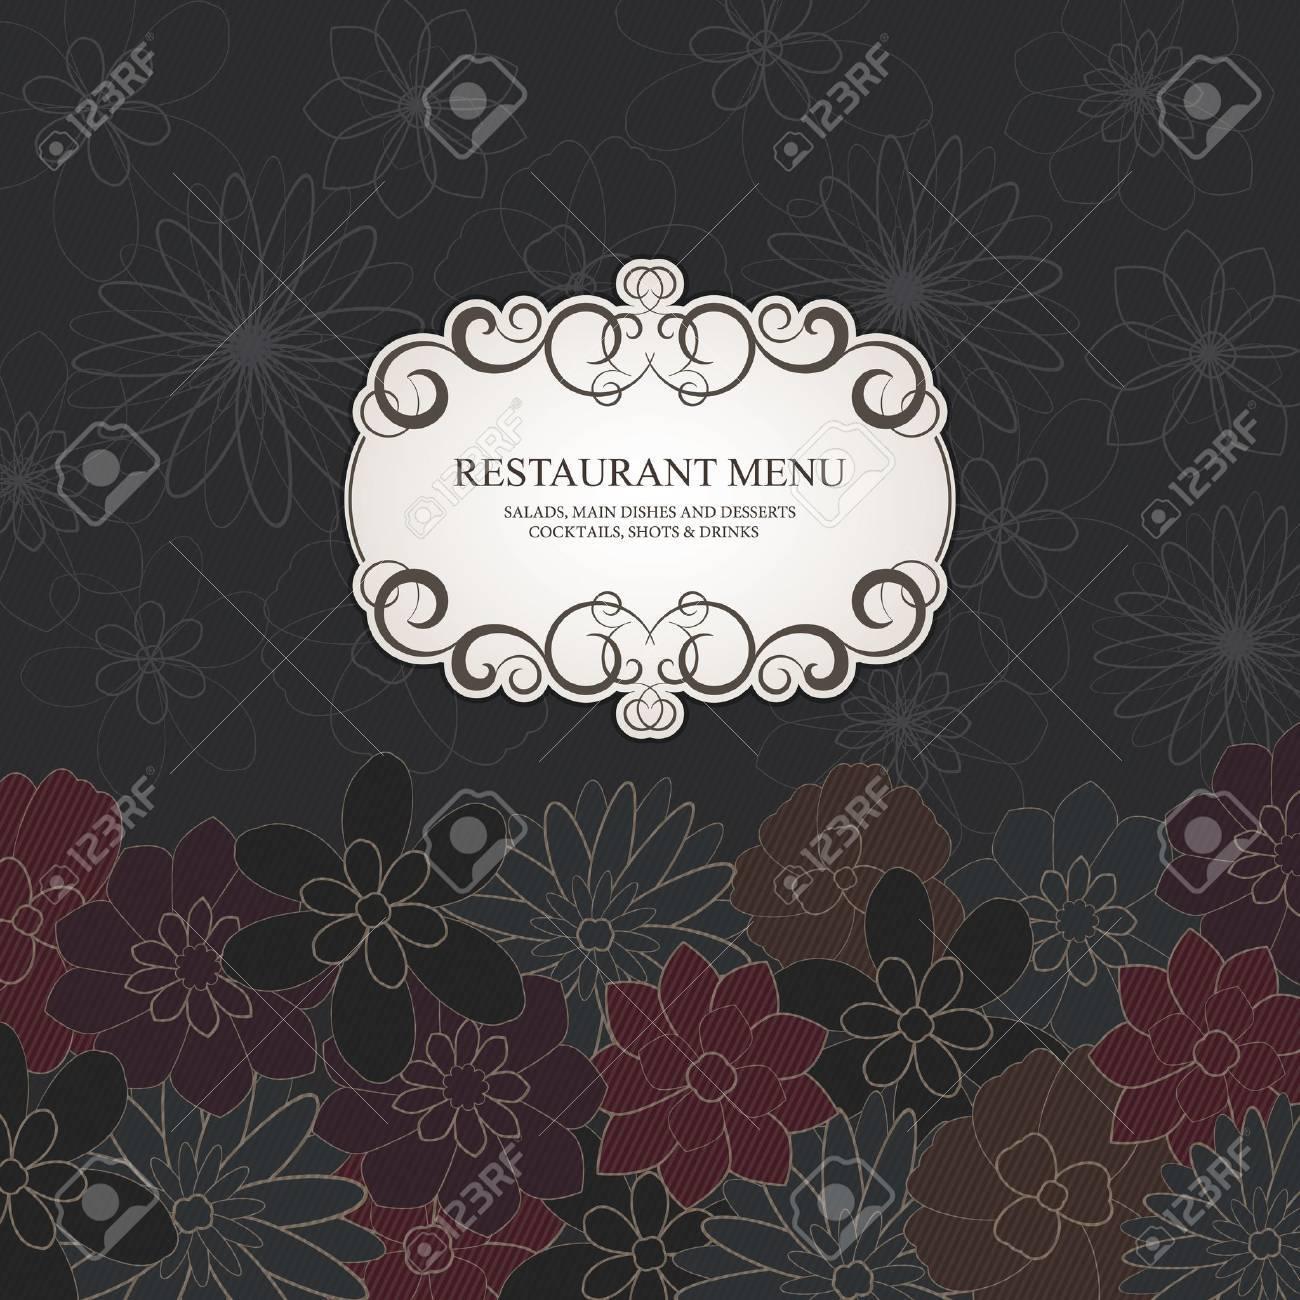 Restaurant menu design, with stylish flower background Stock Vector - 15521094